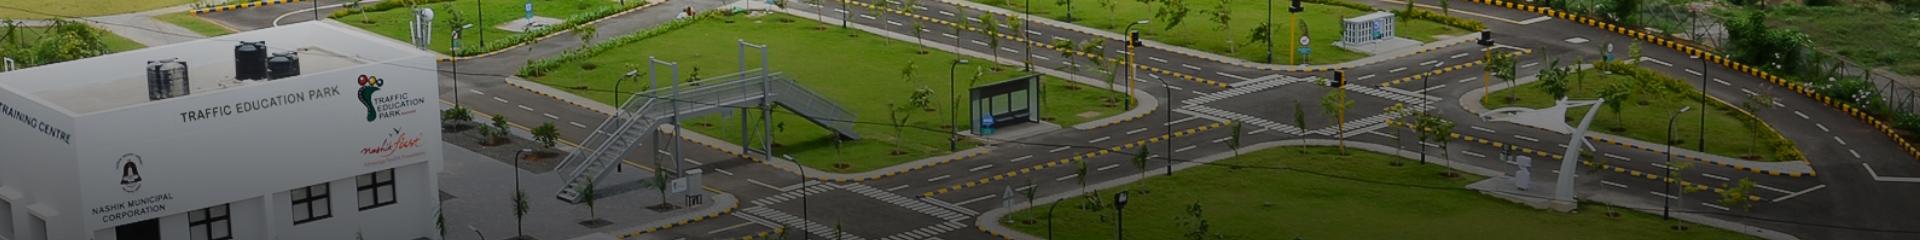 https://www.nashikfirst.com/wp-content/uploads/2020/08/Nashik-Traffic-Training-Park.jpg